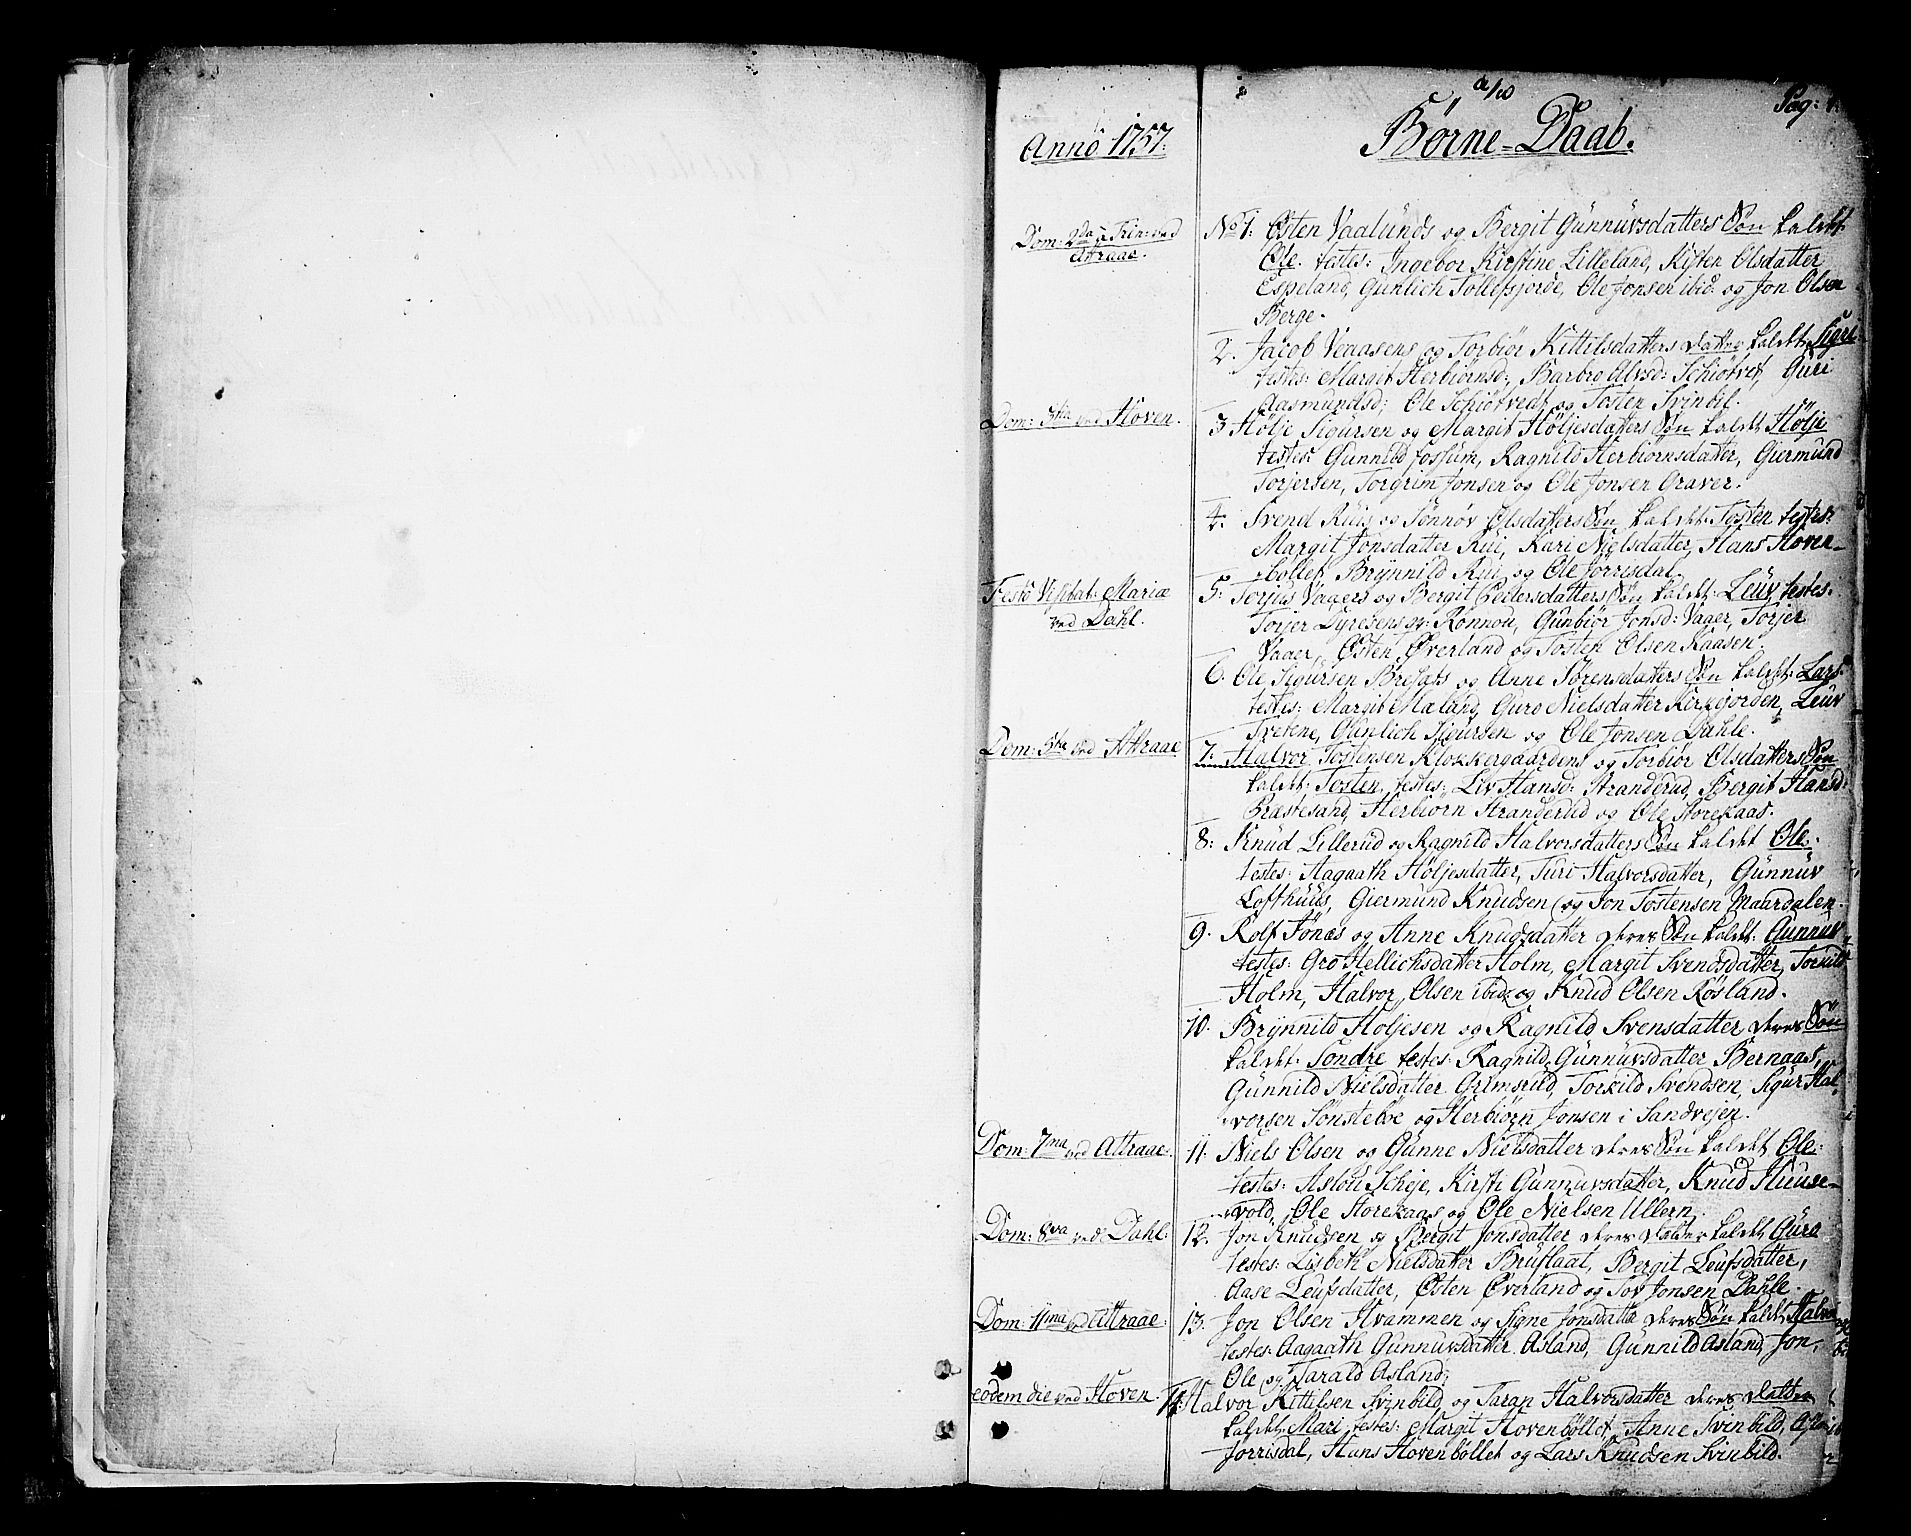 SAKO, Tinn kirkebøker, F/Fa/L0002: Ministerialbok nr. I 2, 1757-1810, s. 0-1